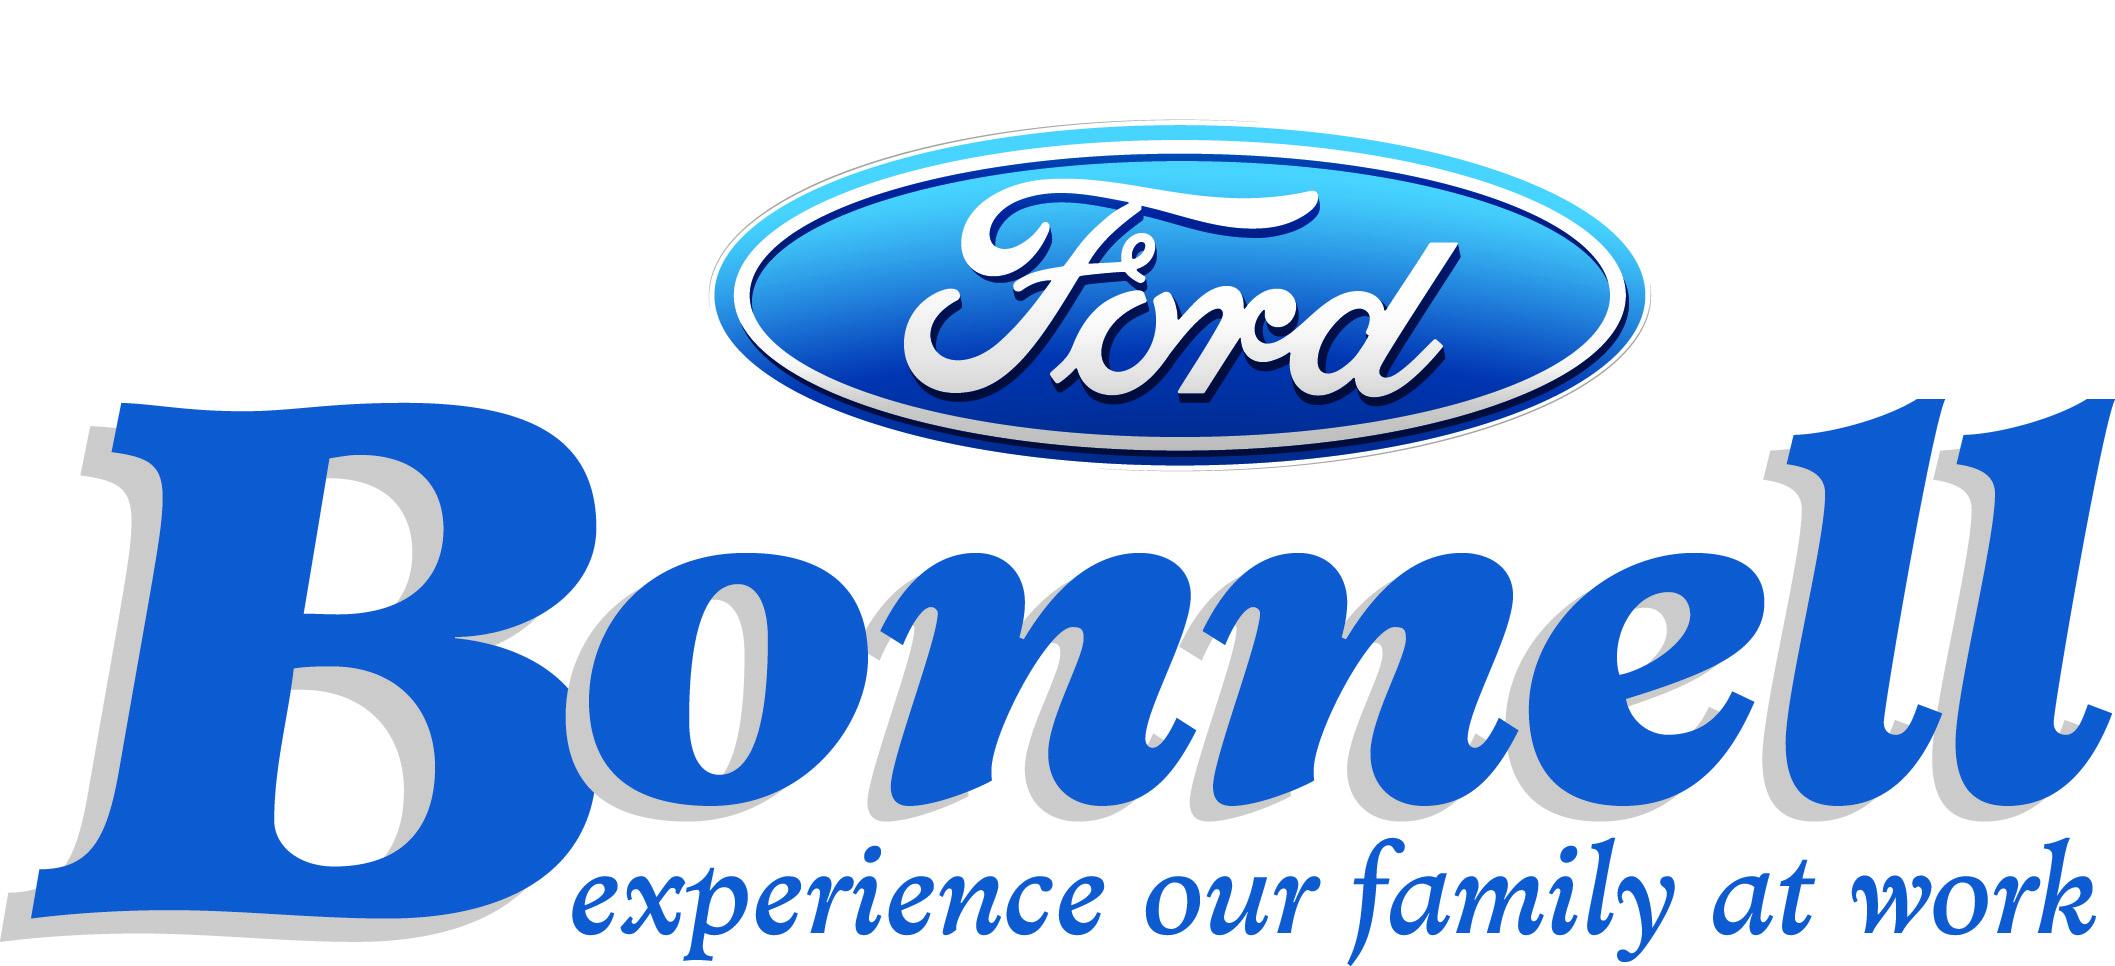 Bonnell Ford logo